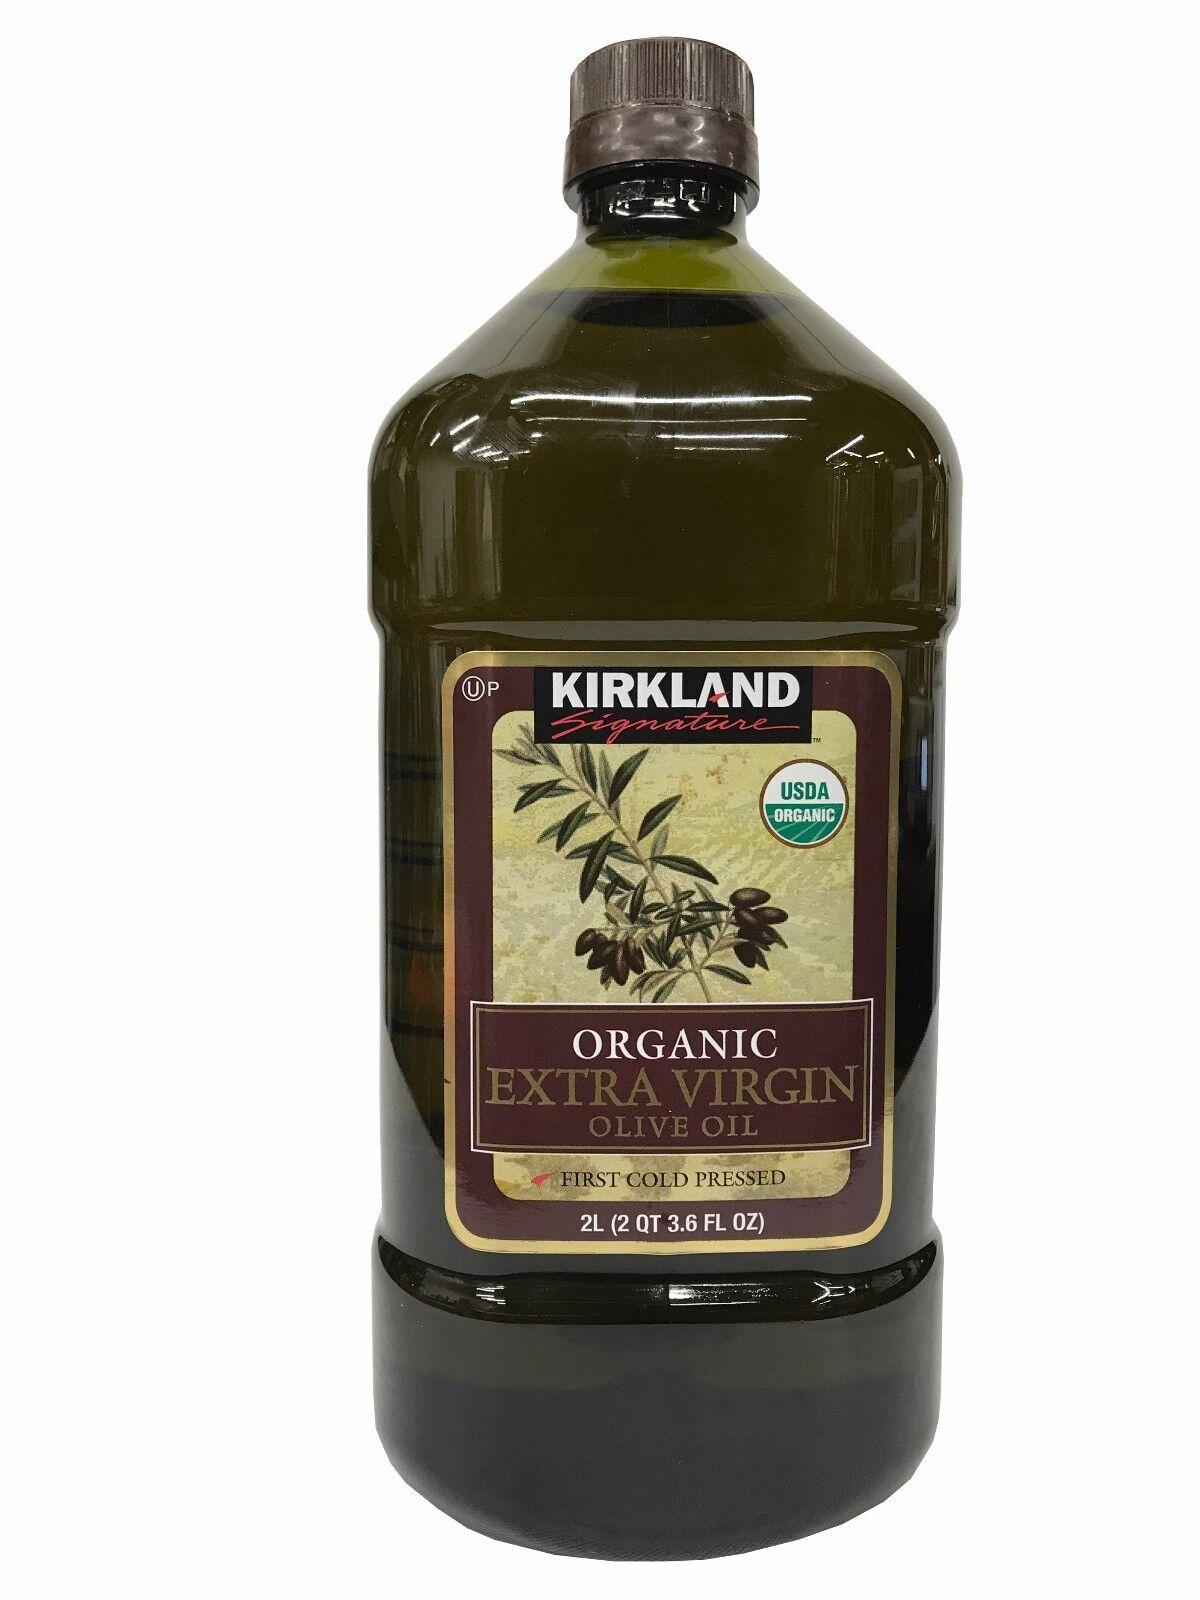 Kirkland Signature Organic Extra Virgin Olive Oil 2L  from I